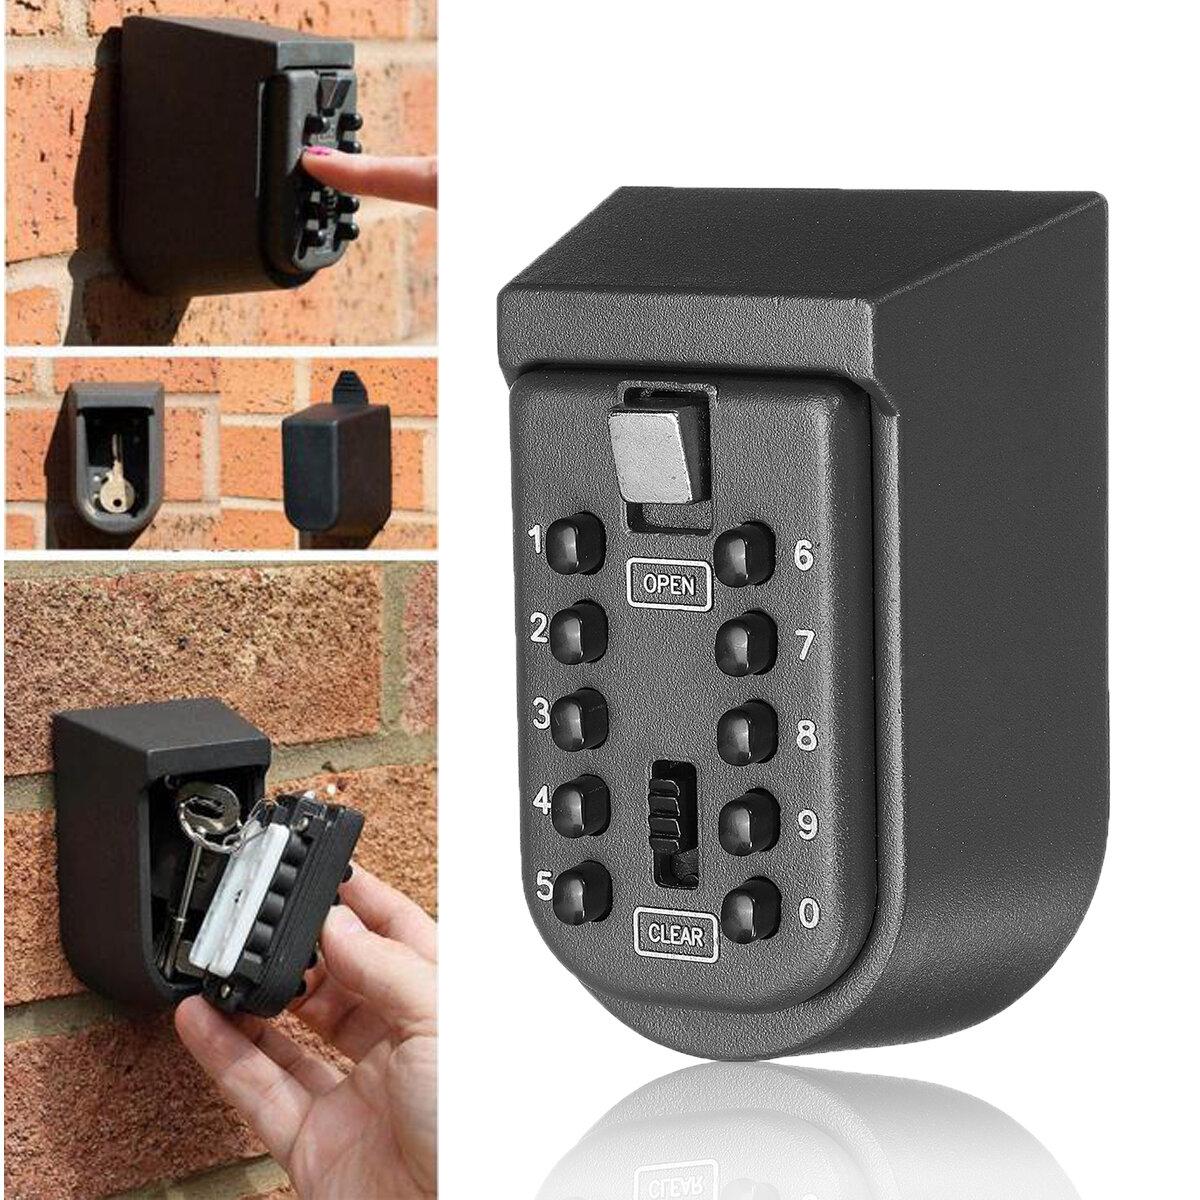 Outdoor Wall Mount Key Safe Combination Lock Storage Box 10-Digital Password